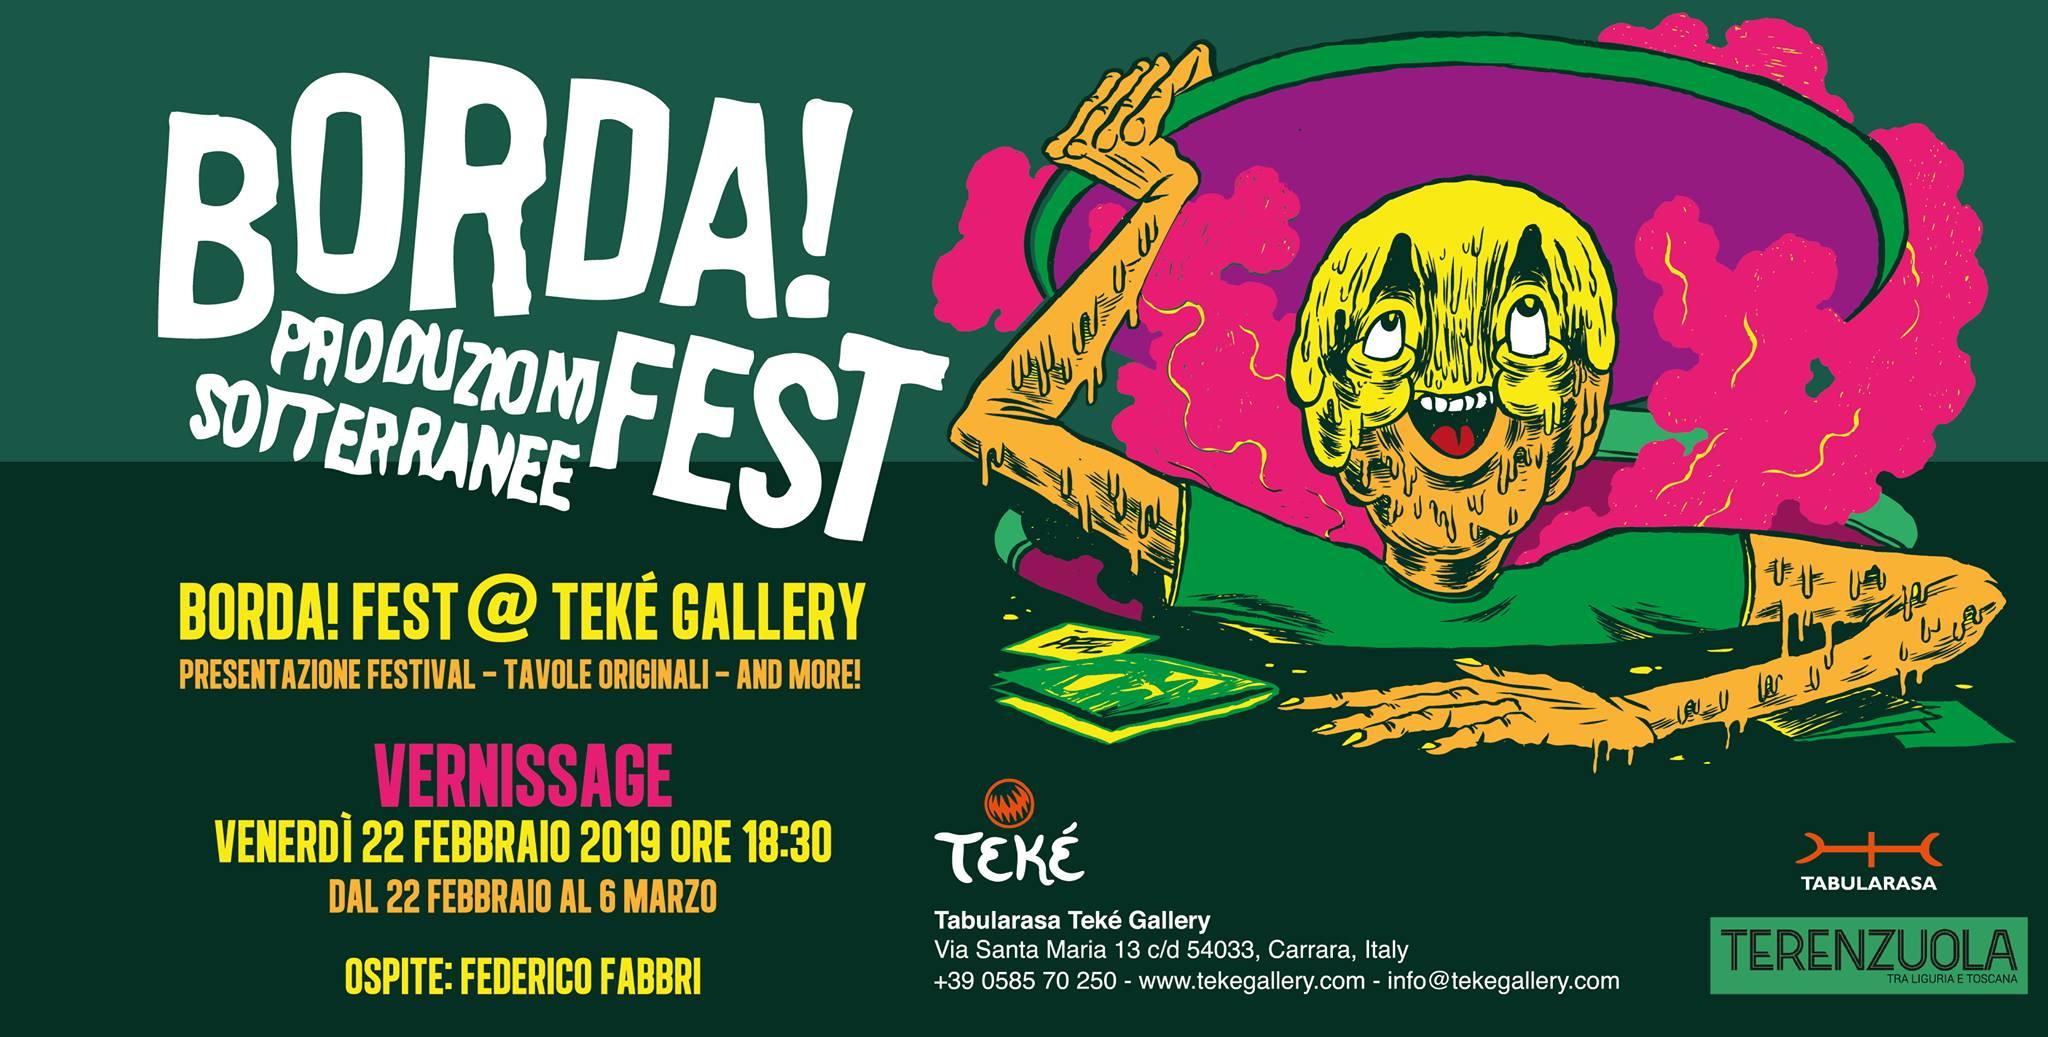 Borda!Fest 1 - fanzine